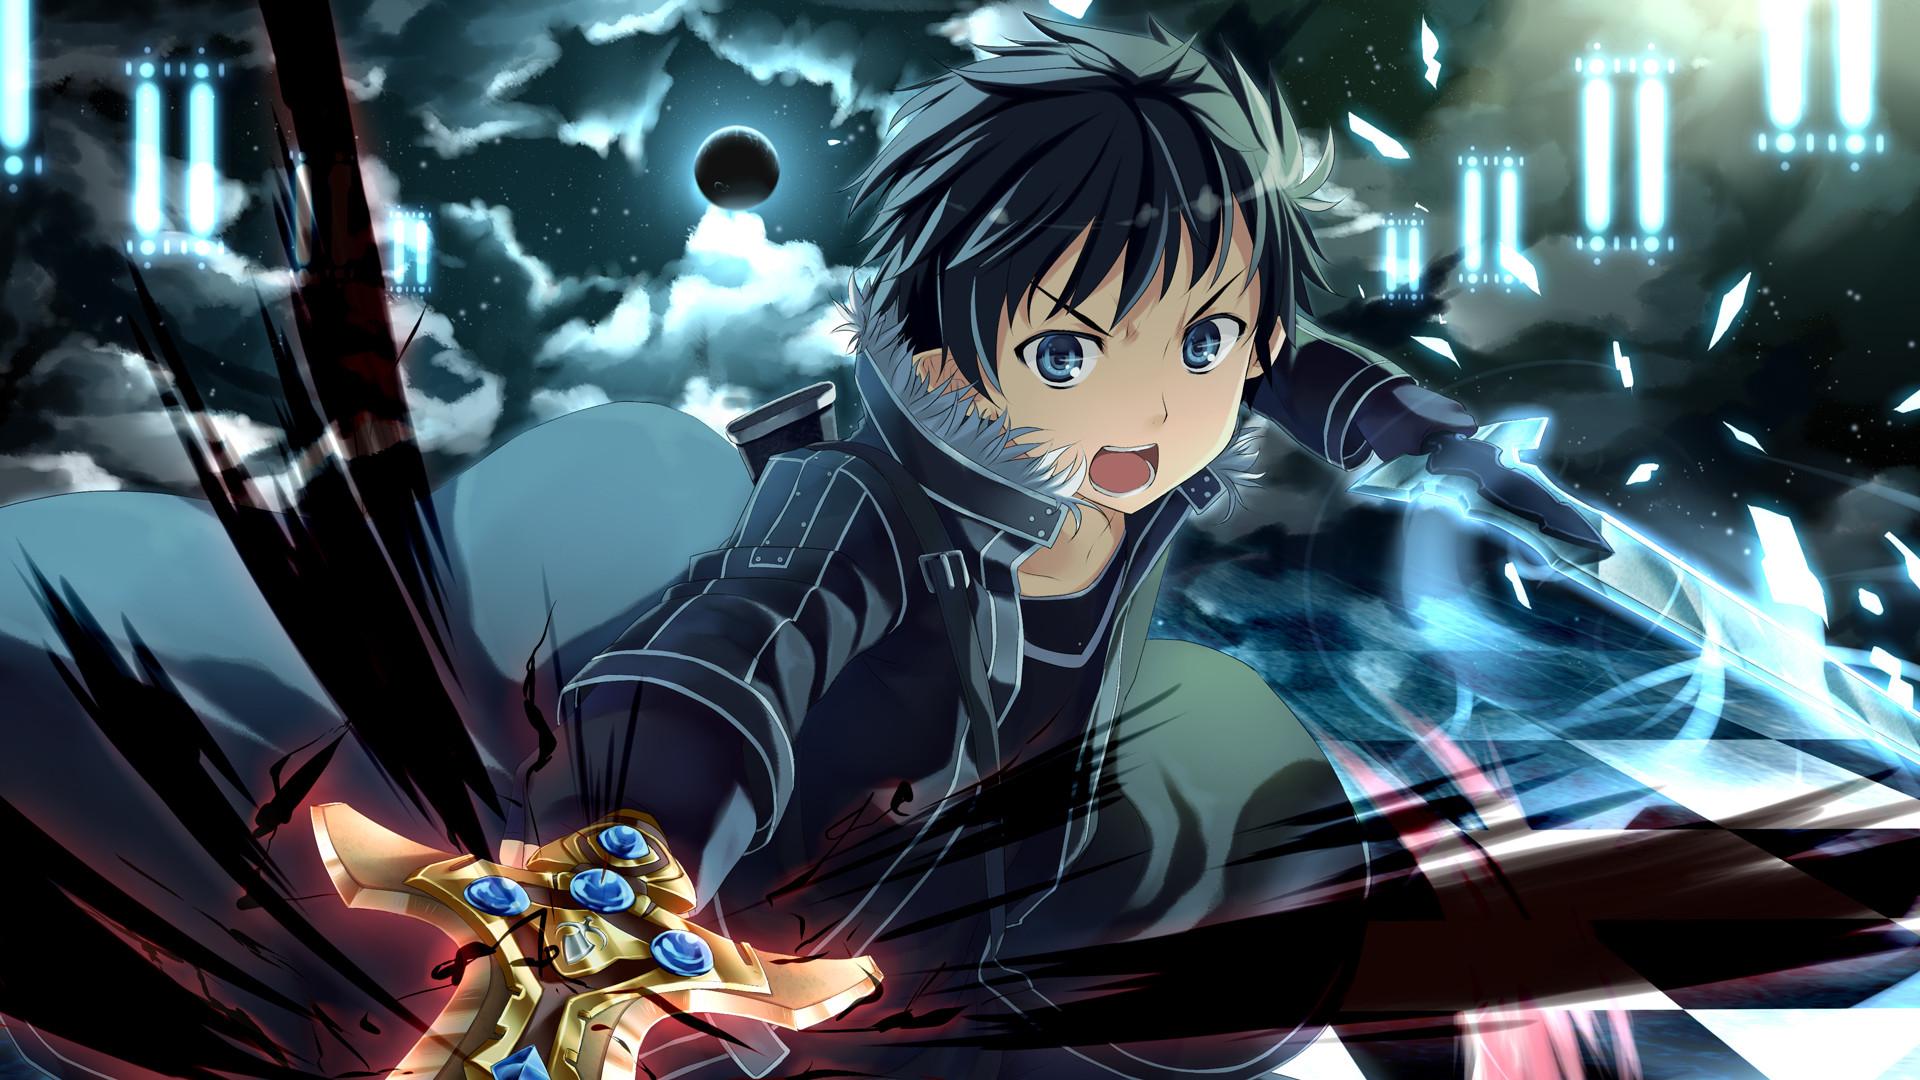 Kirito(Sword Art Online) images kirito HD wallpaper and background photos